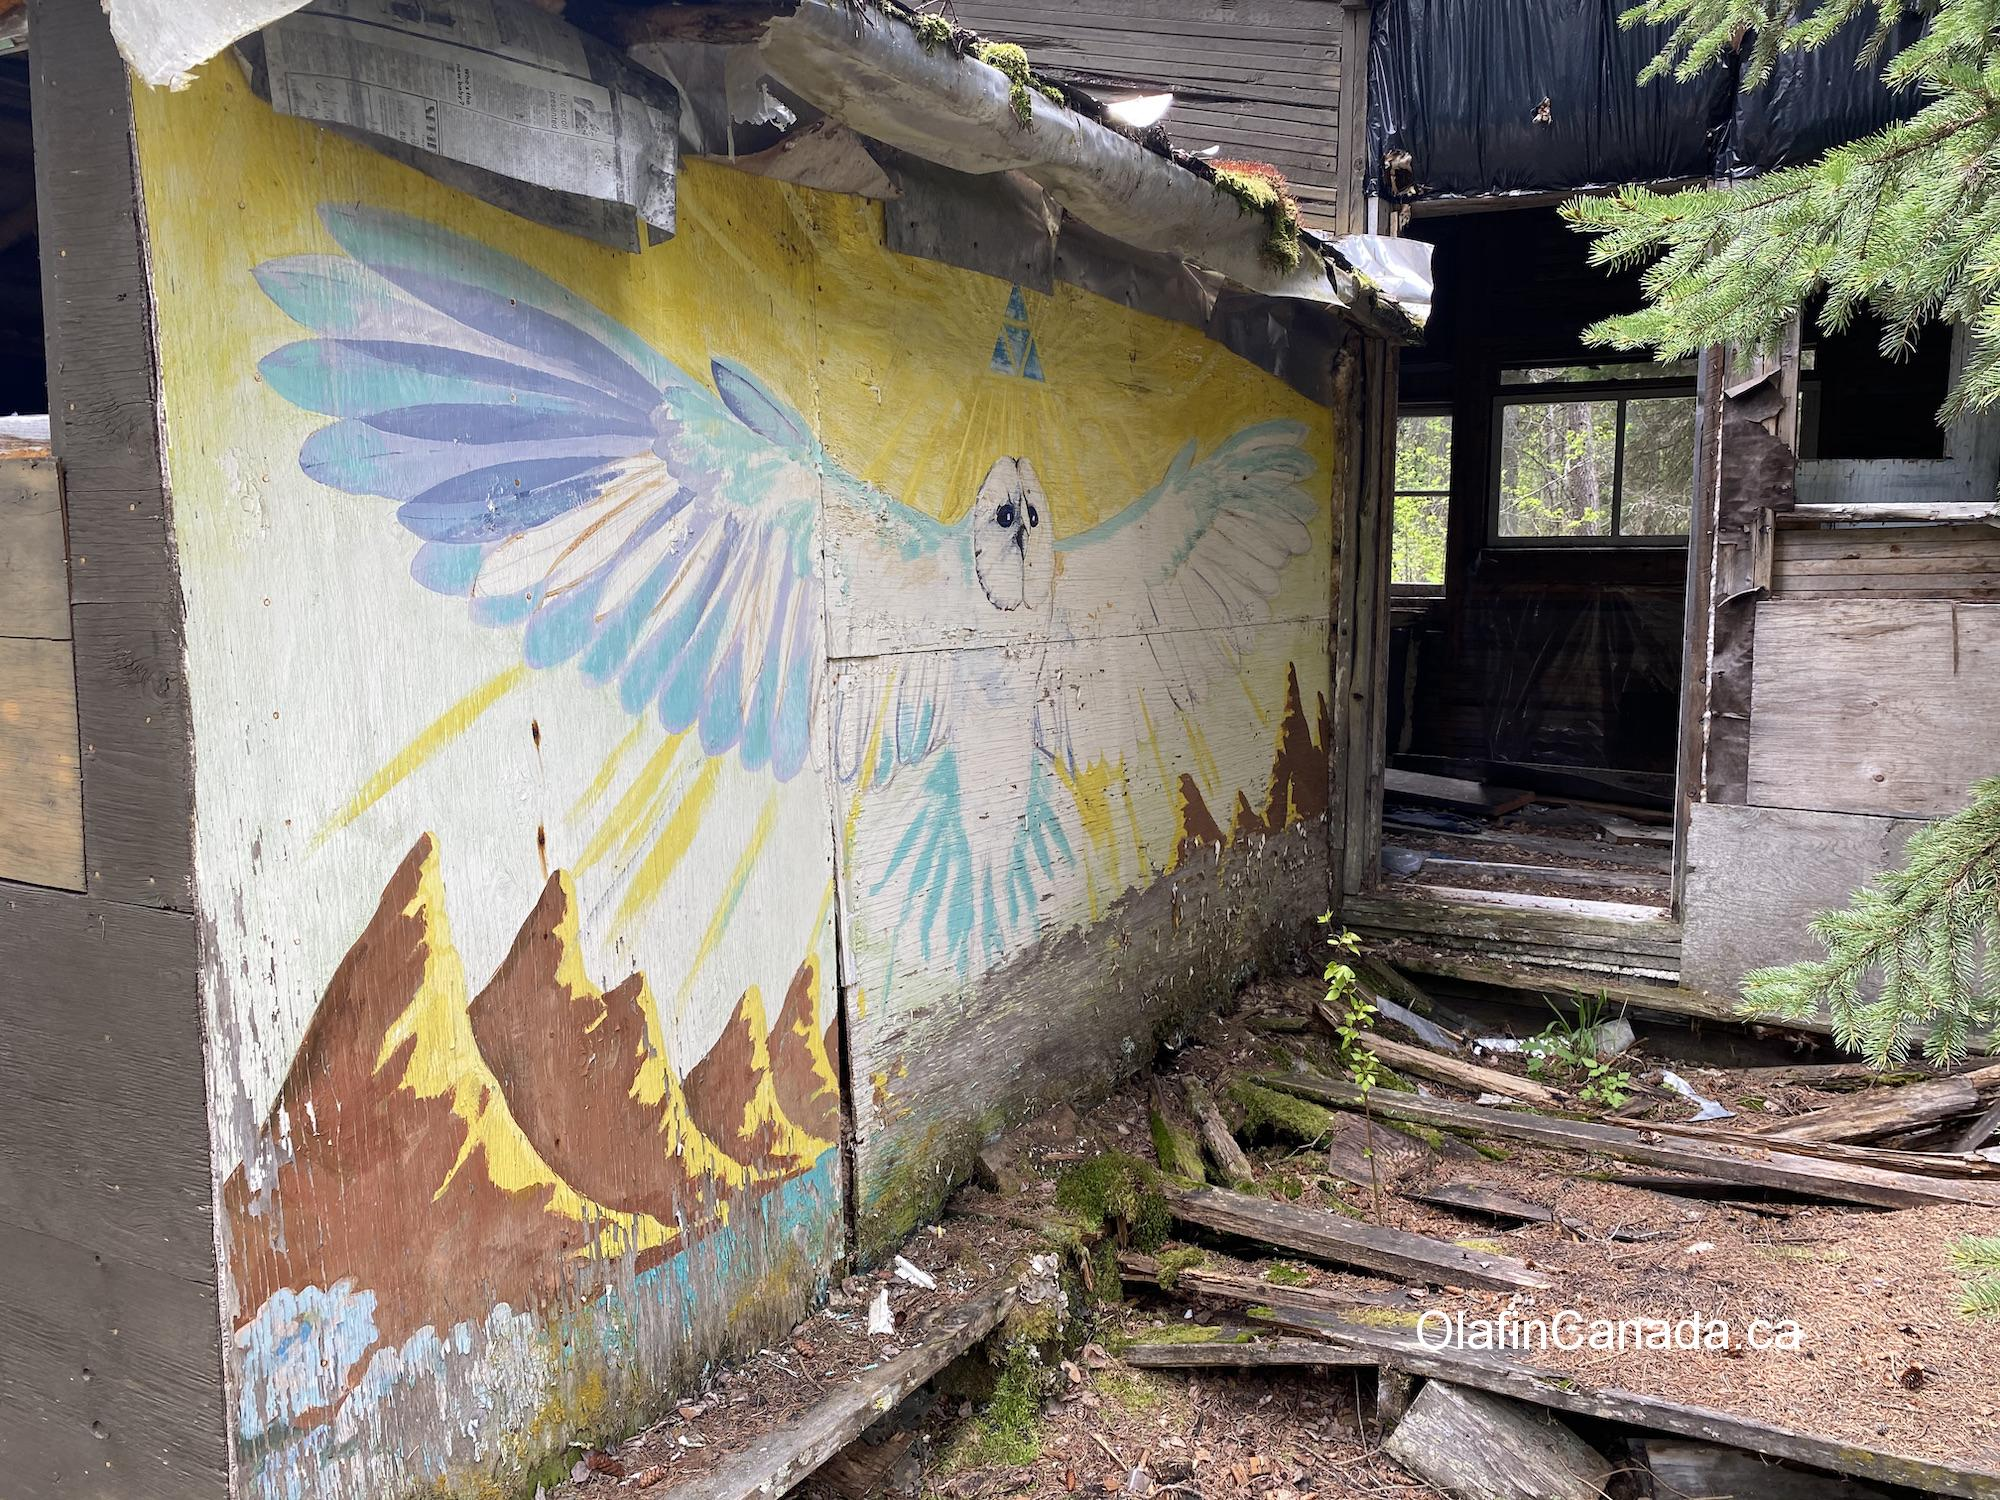 Mural of an owl in Stocks Meadow in West Kelowna. #olafincanada #britishcolumbia #discoverbc #abandonedbc #stocksmeadow #hippies